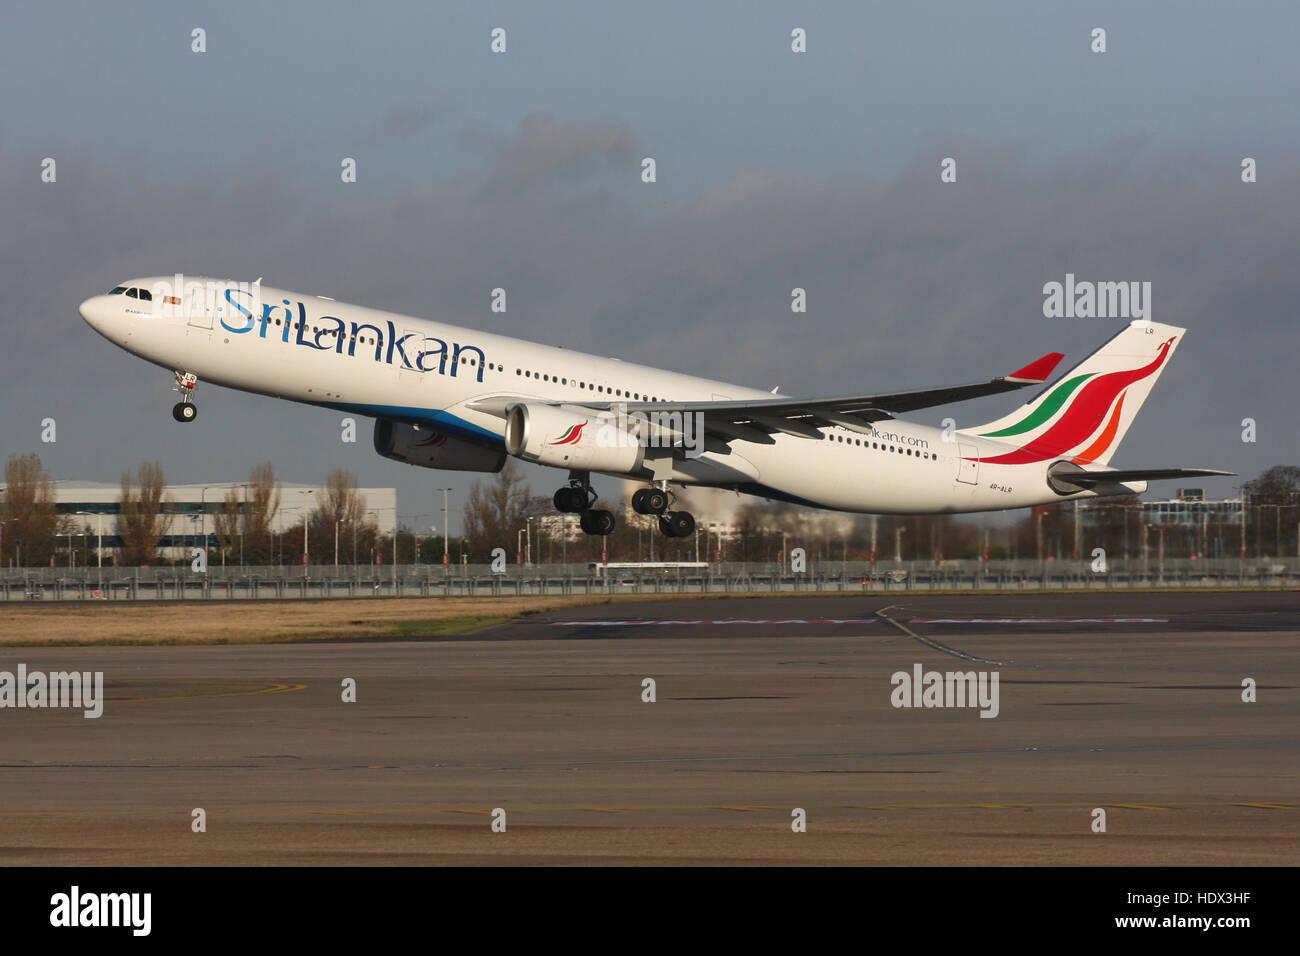 SRI LANKAN A330 - Stock Image